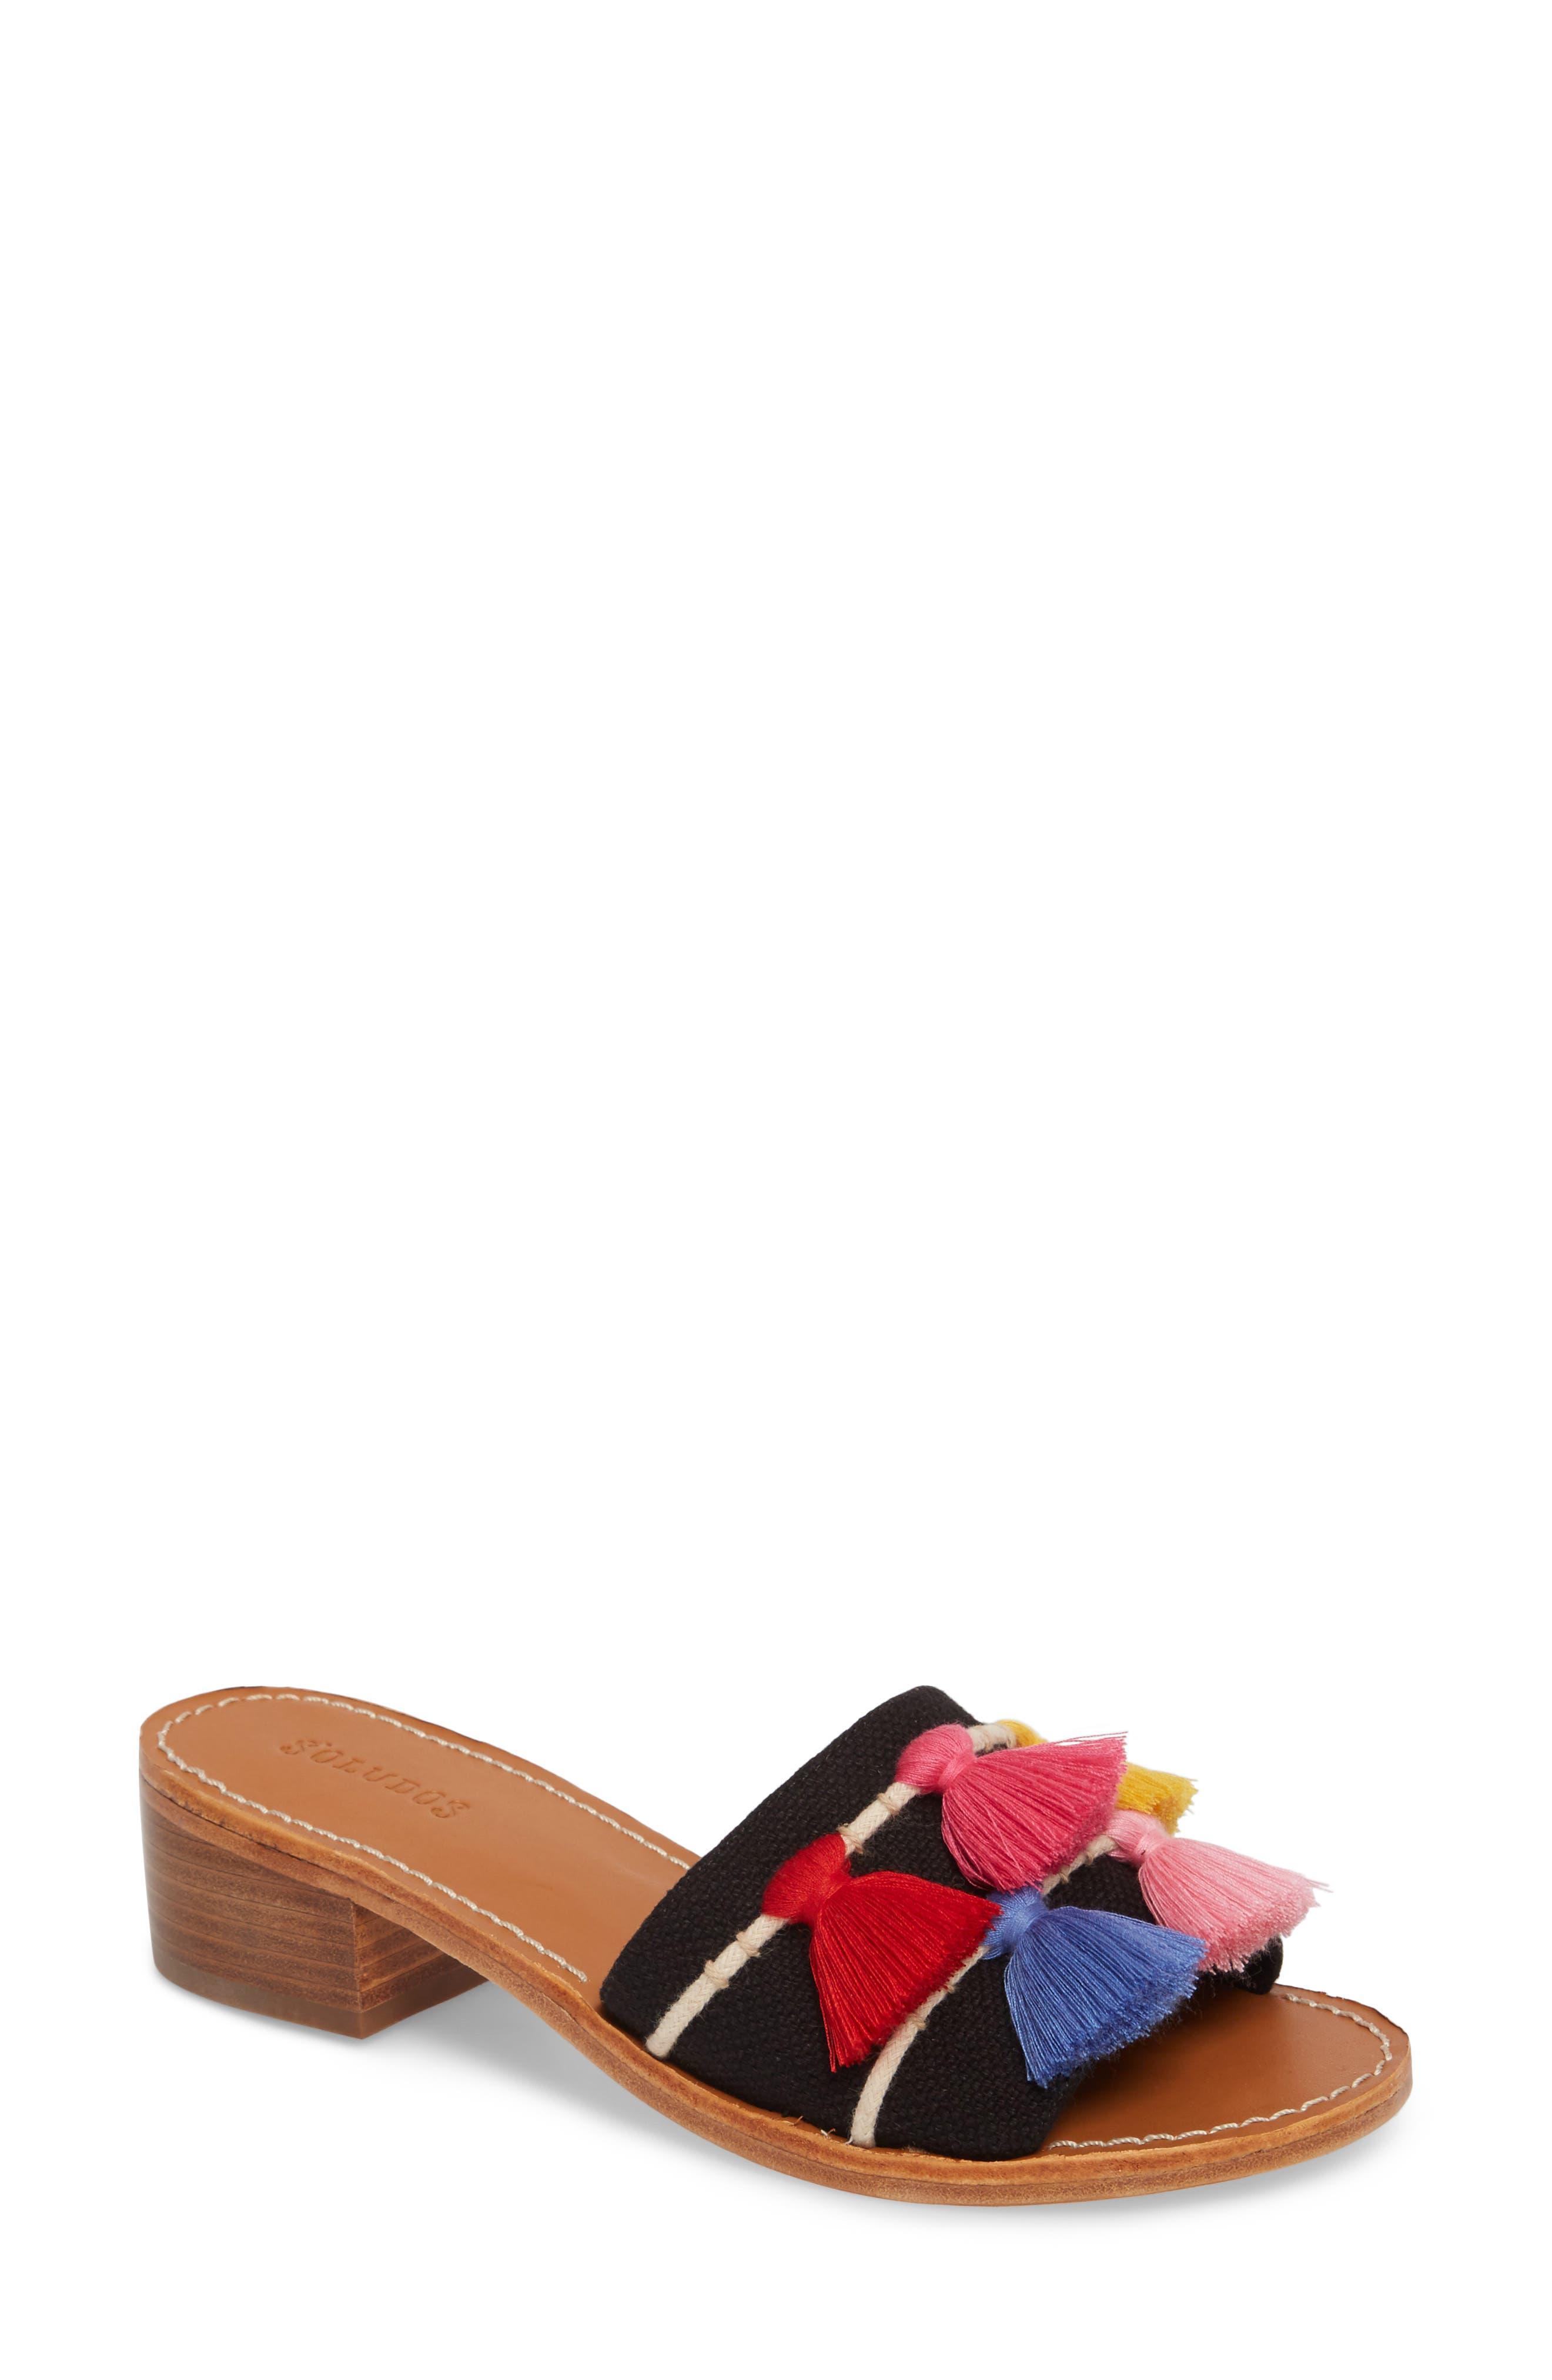 Tassel City Sandal,                         Main,                         color, 001